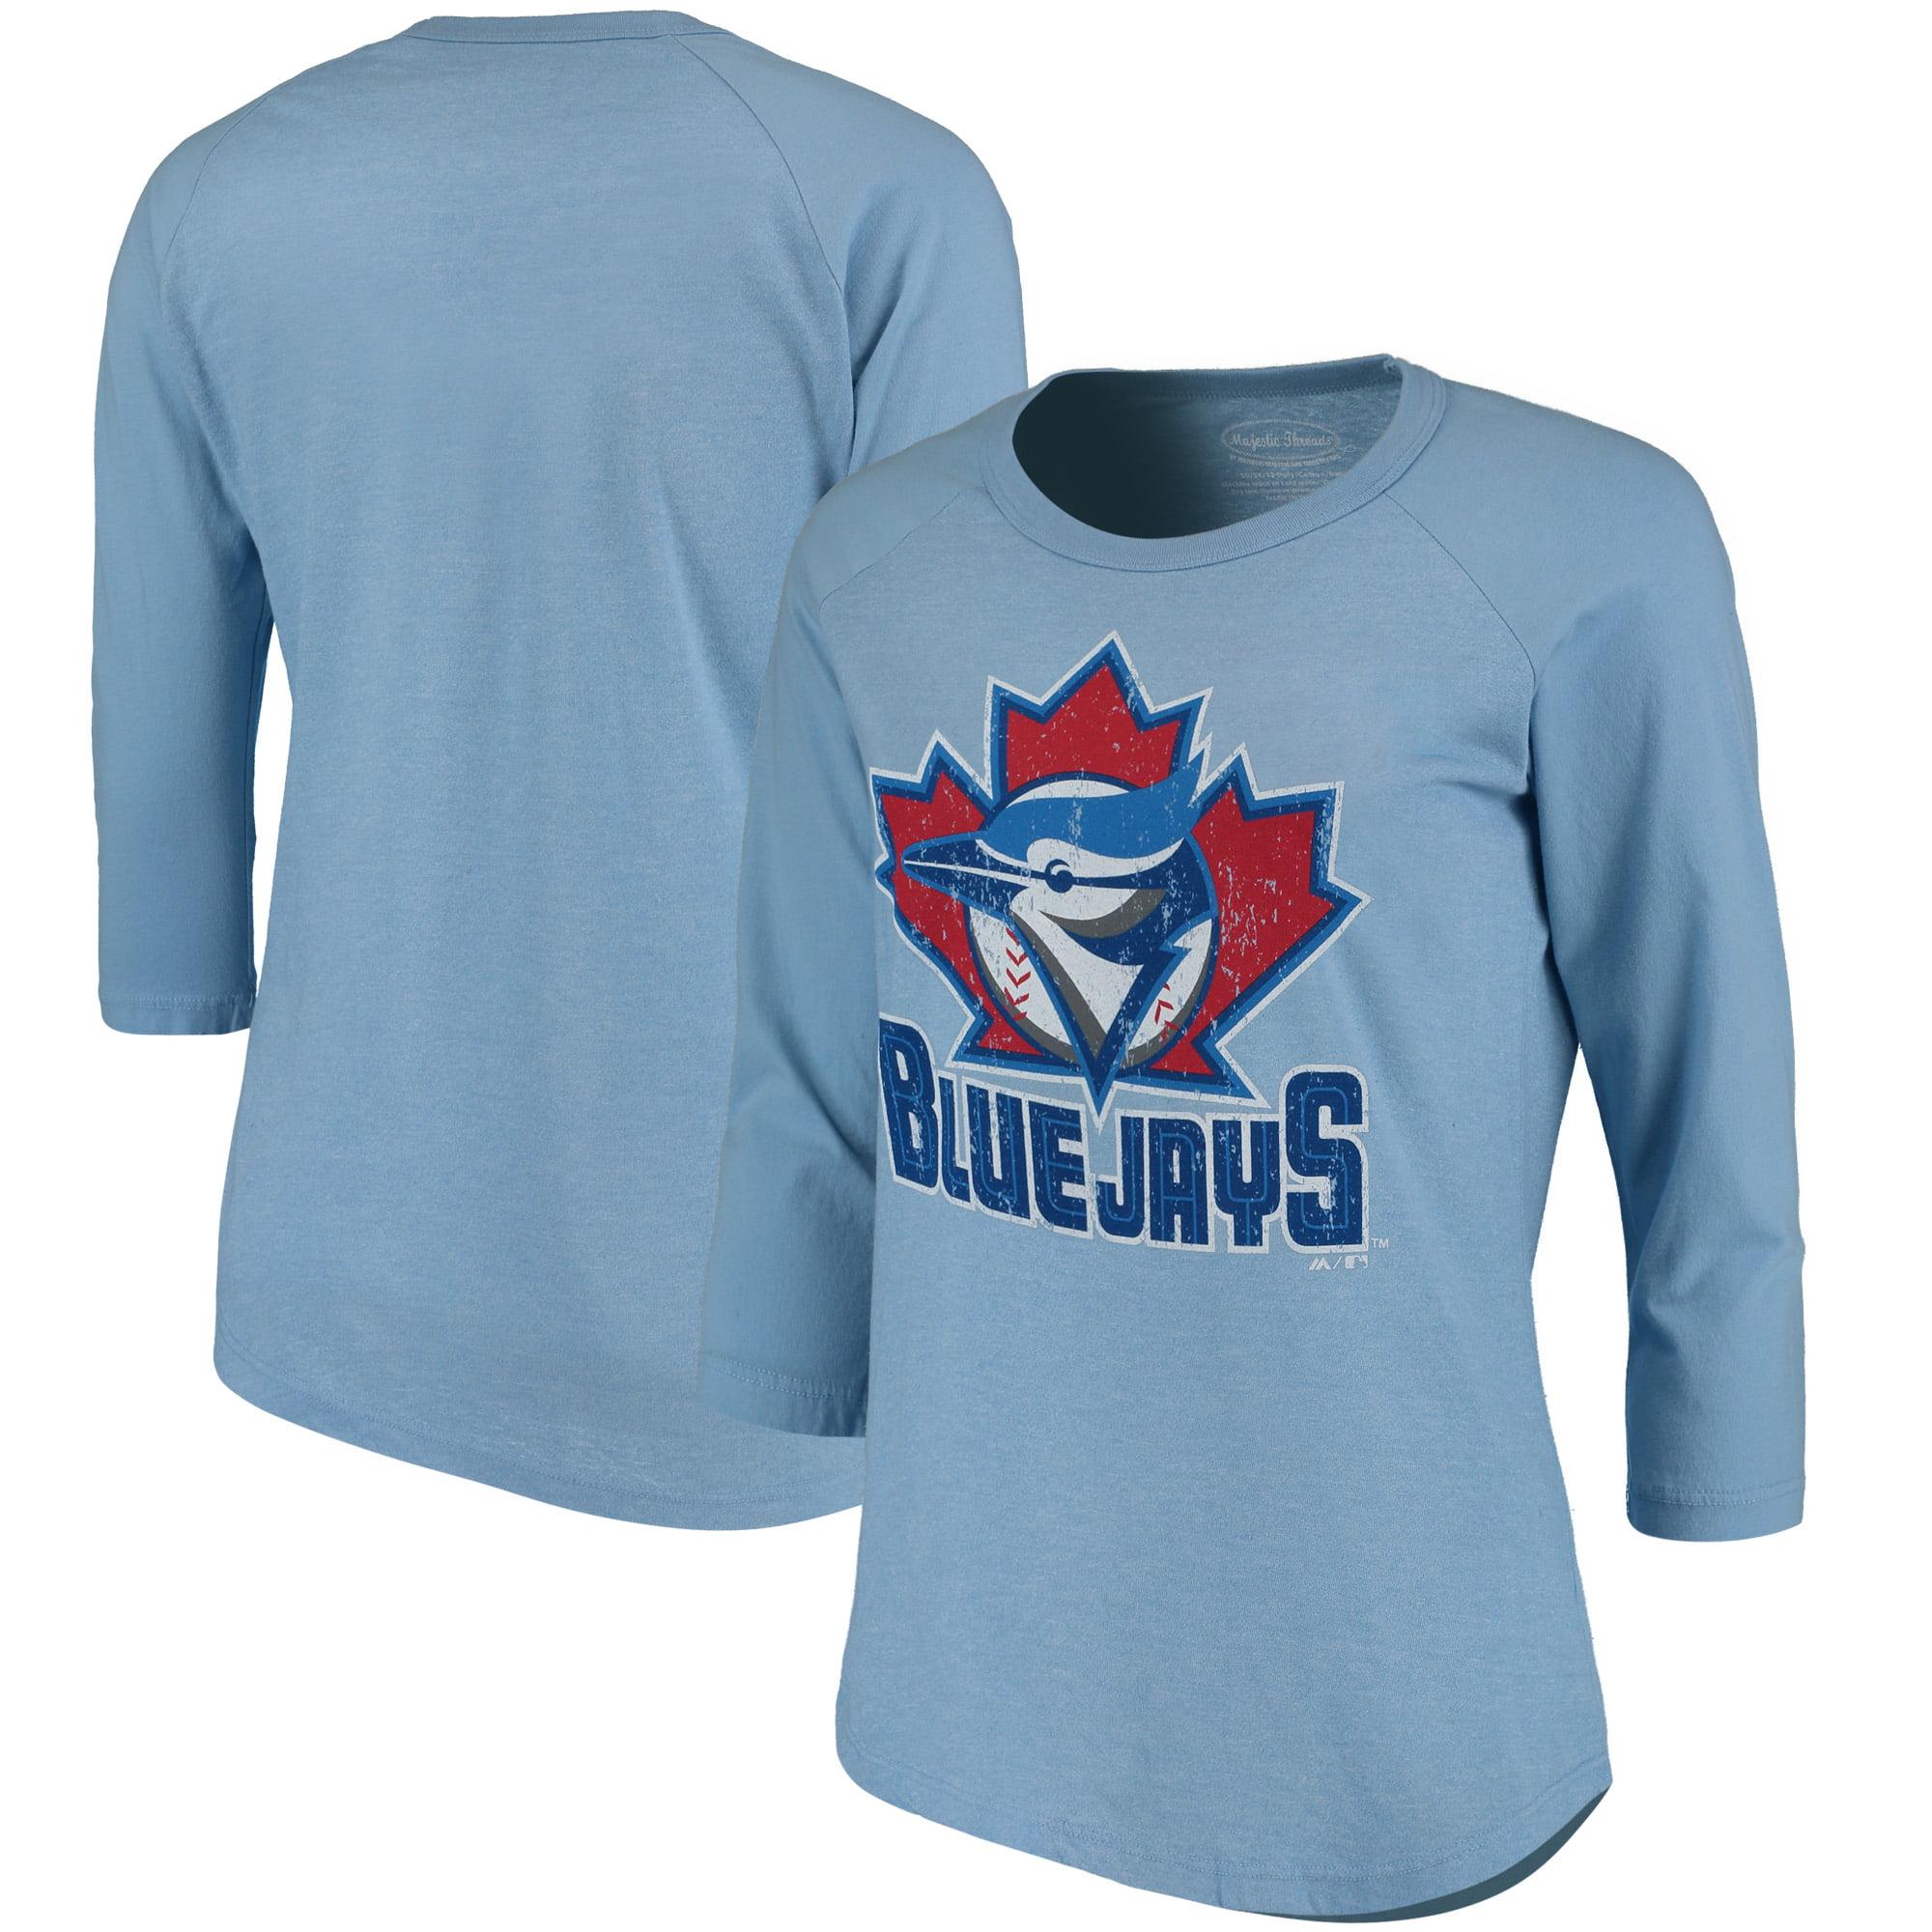 Toronto Blue Jays Majestic Threads Women's Cooperstown Collection Raglan Three-Quarter Sleeve T-Shirt - Light Blue